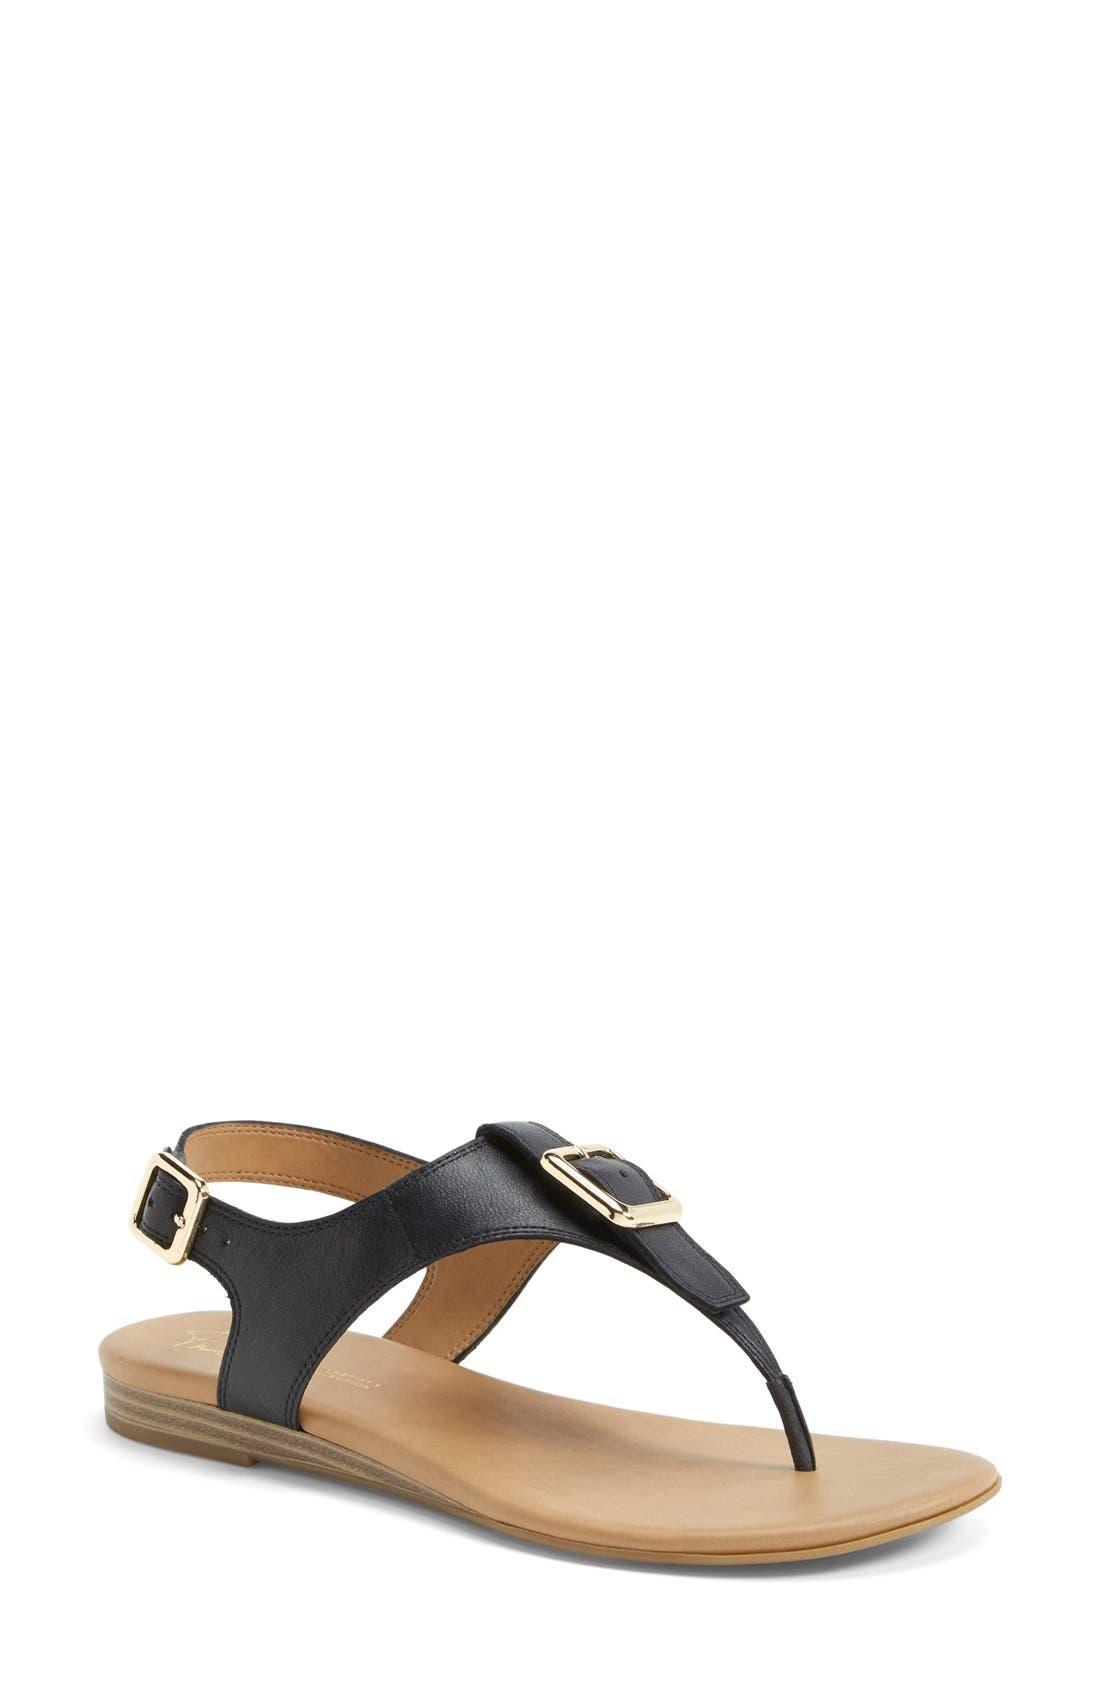 'Gita' Thong Sandal,                         Main,                         color, 001